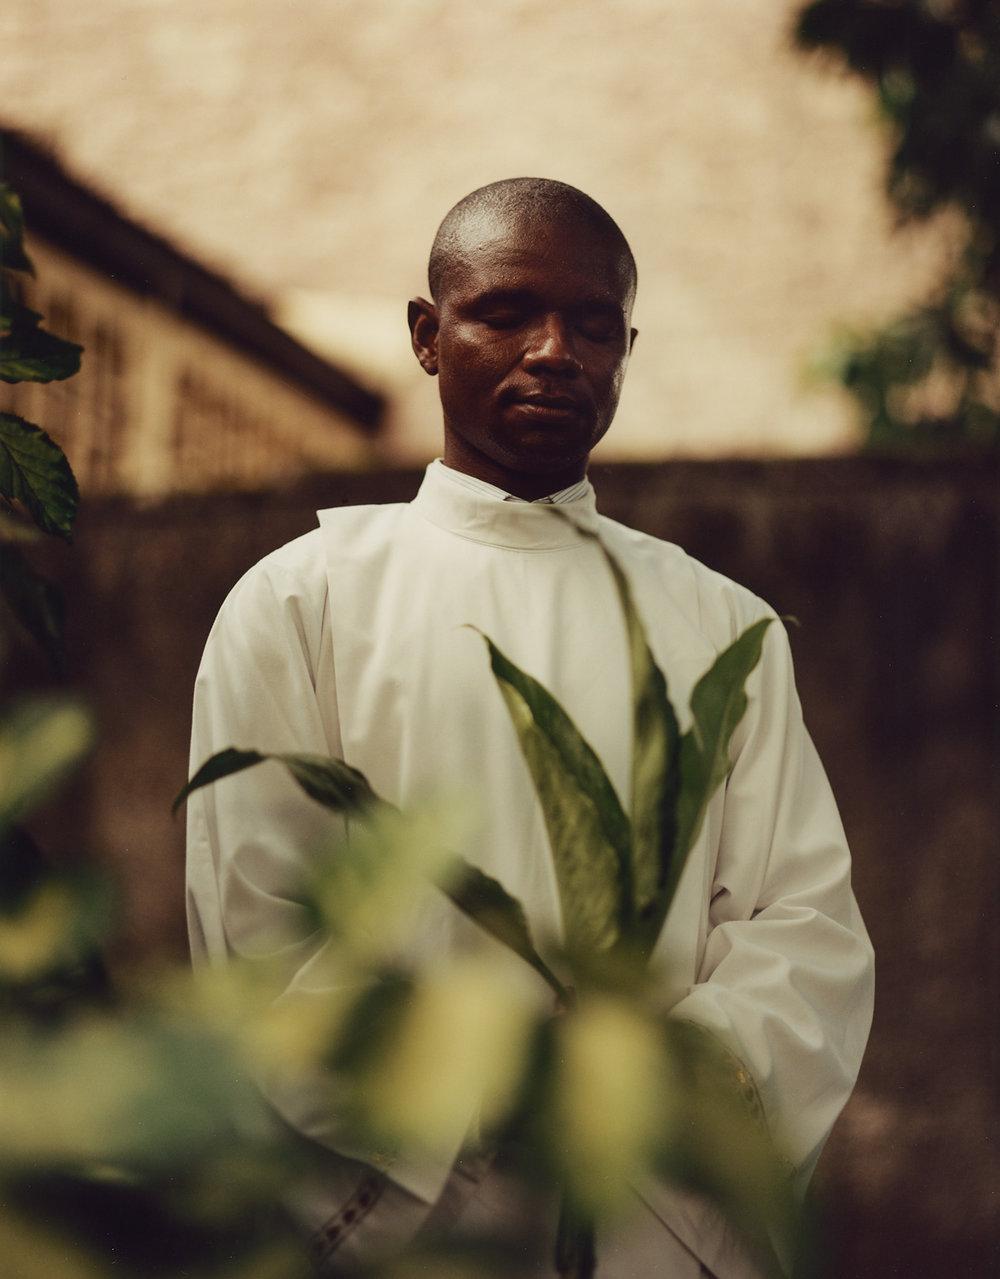 Père Jean Nkongolo, St. Dominique, Limete, Kinshasa.